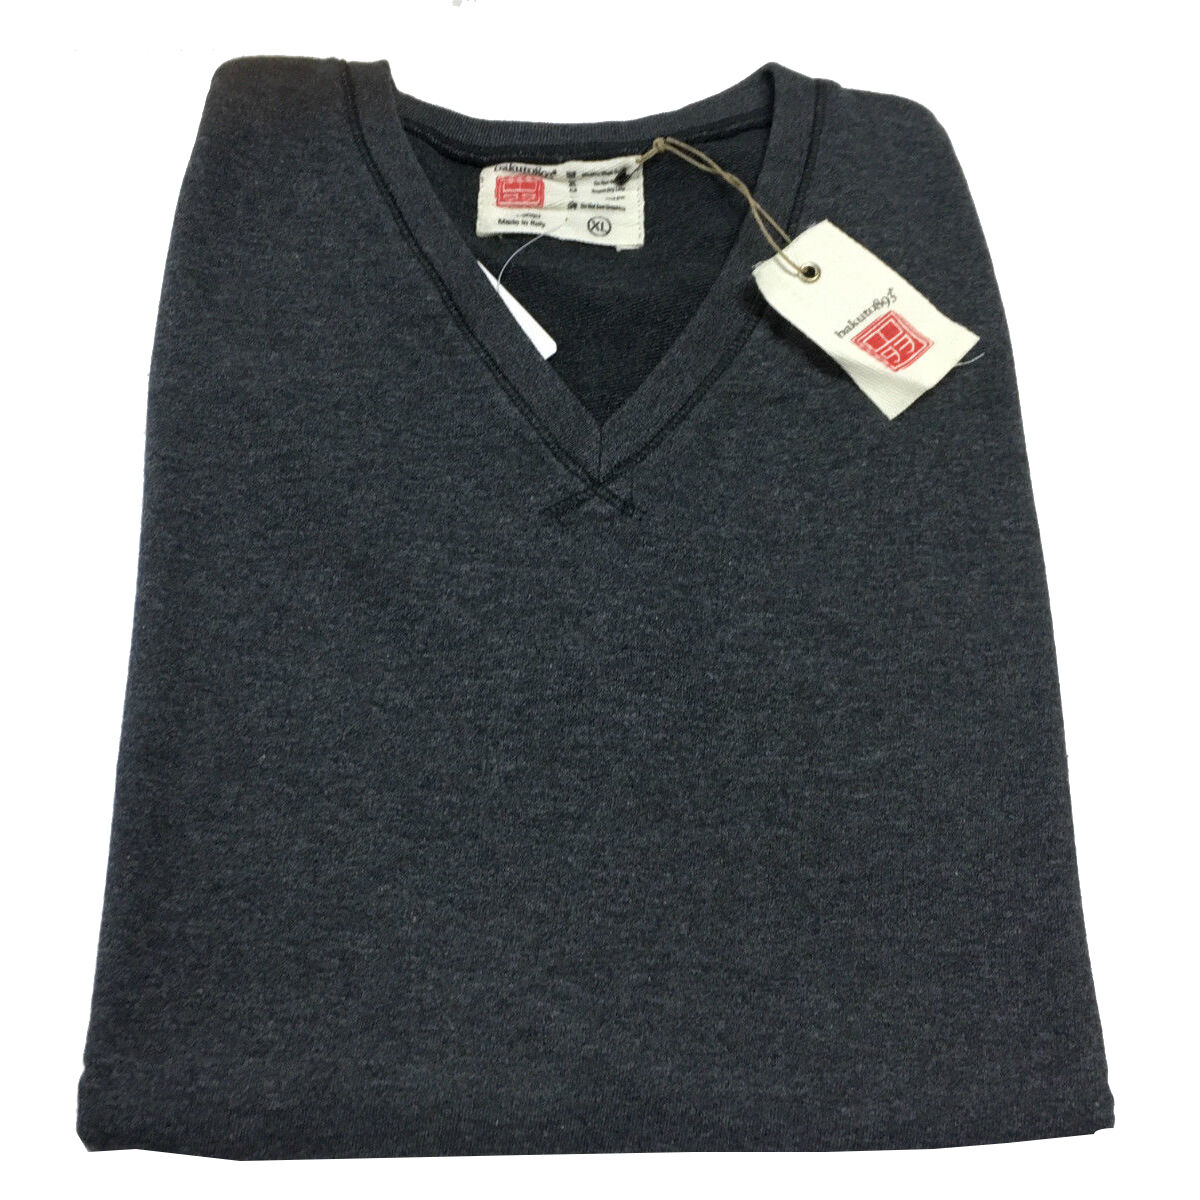 BAKUTO 893 Weste Herren gebürstetem Fleece dunkelgrau schlank 100% Baumwolle